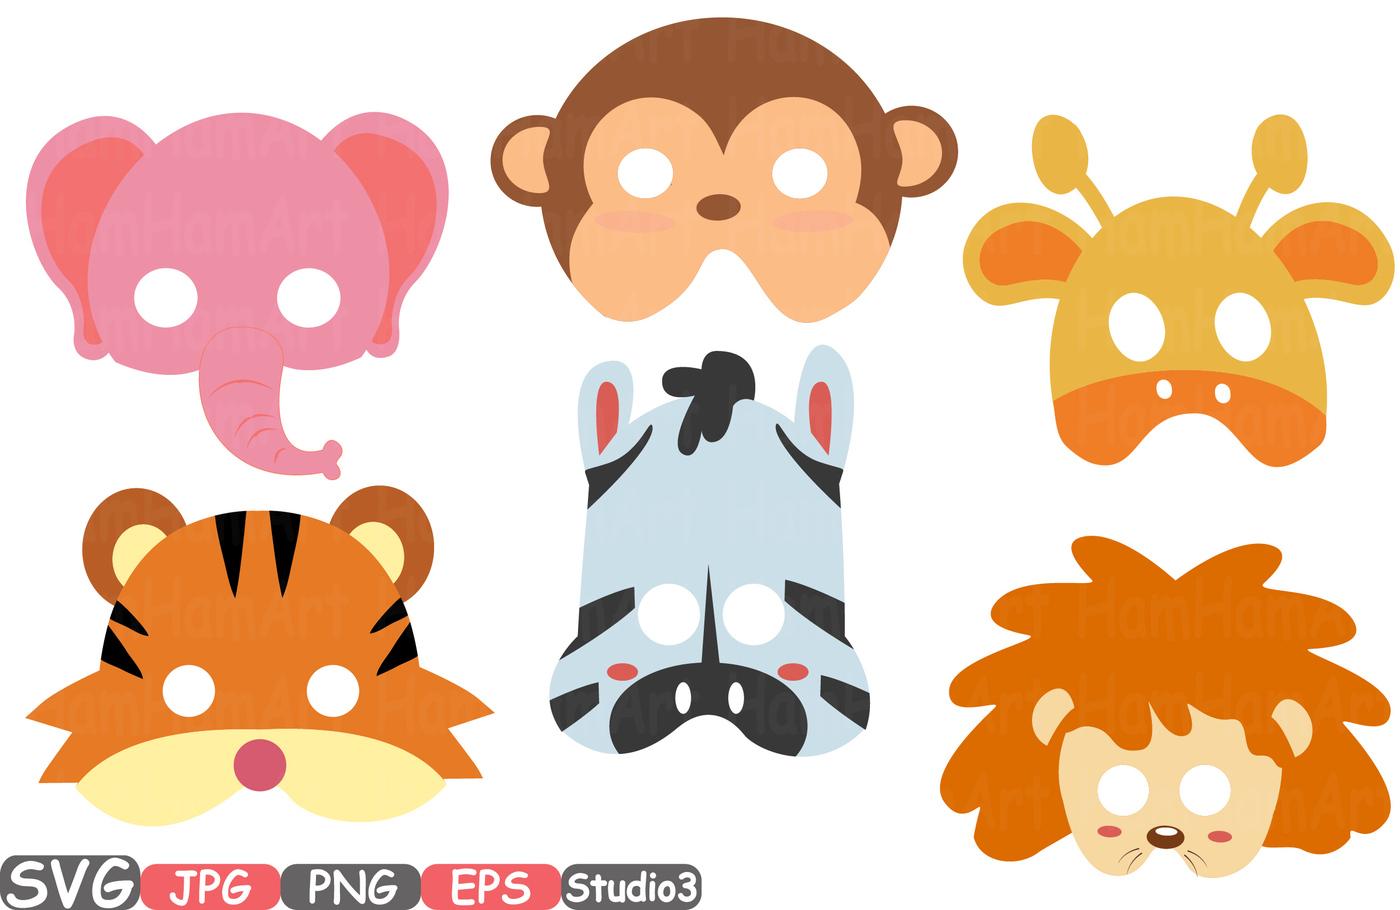 Animal Mask Clipart at GetDrawings.com.